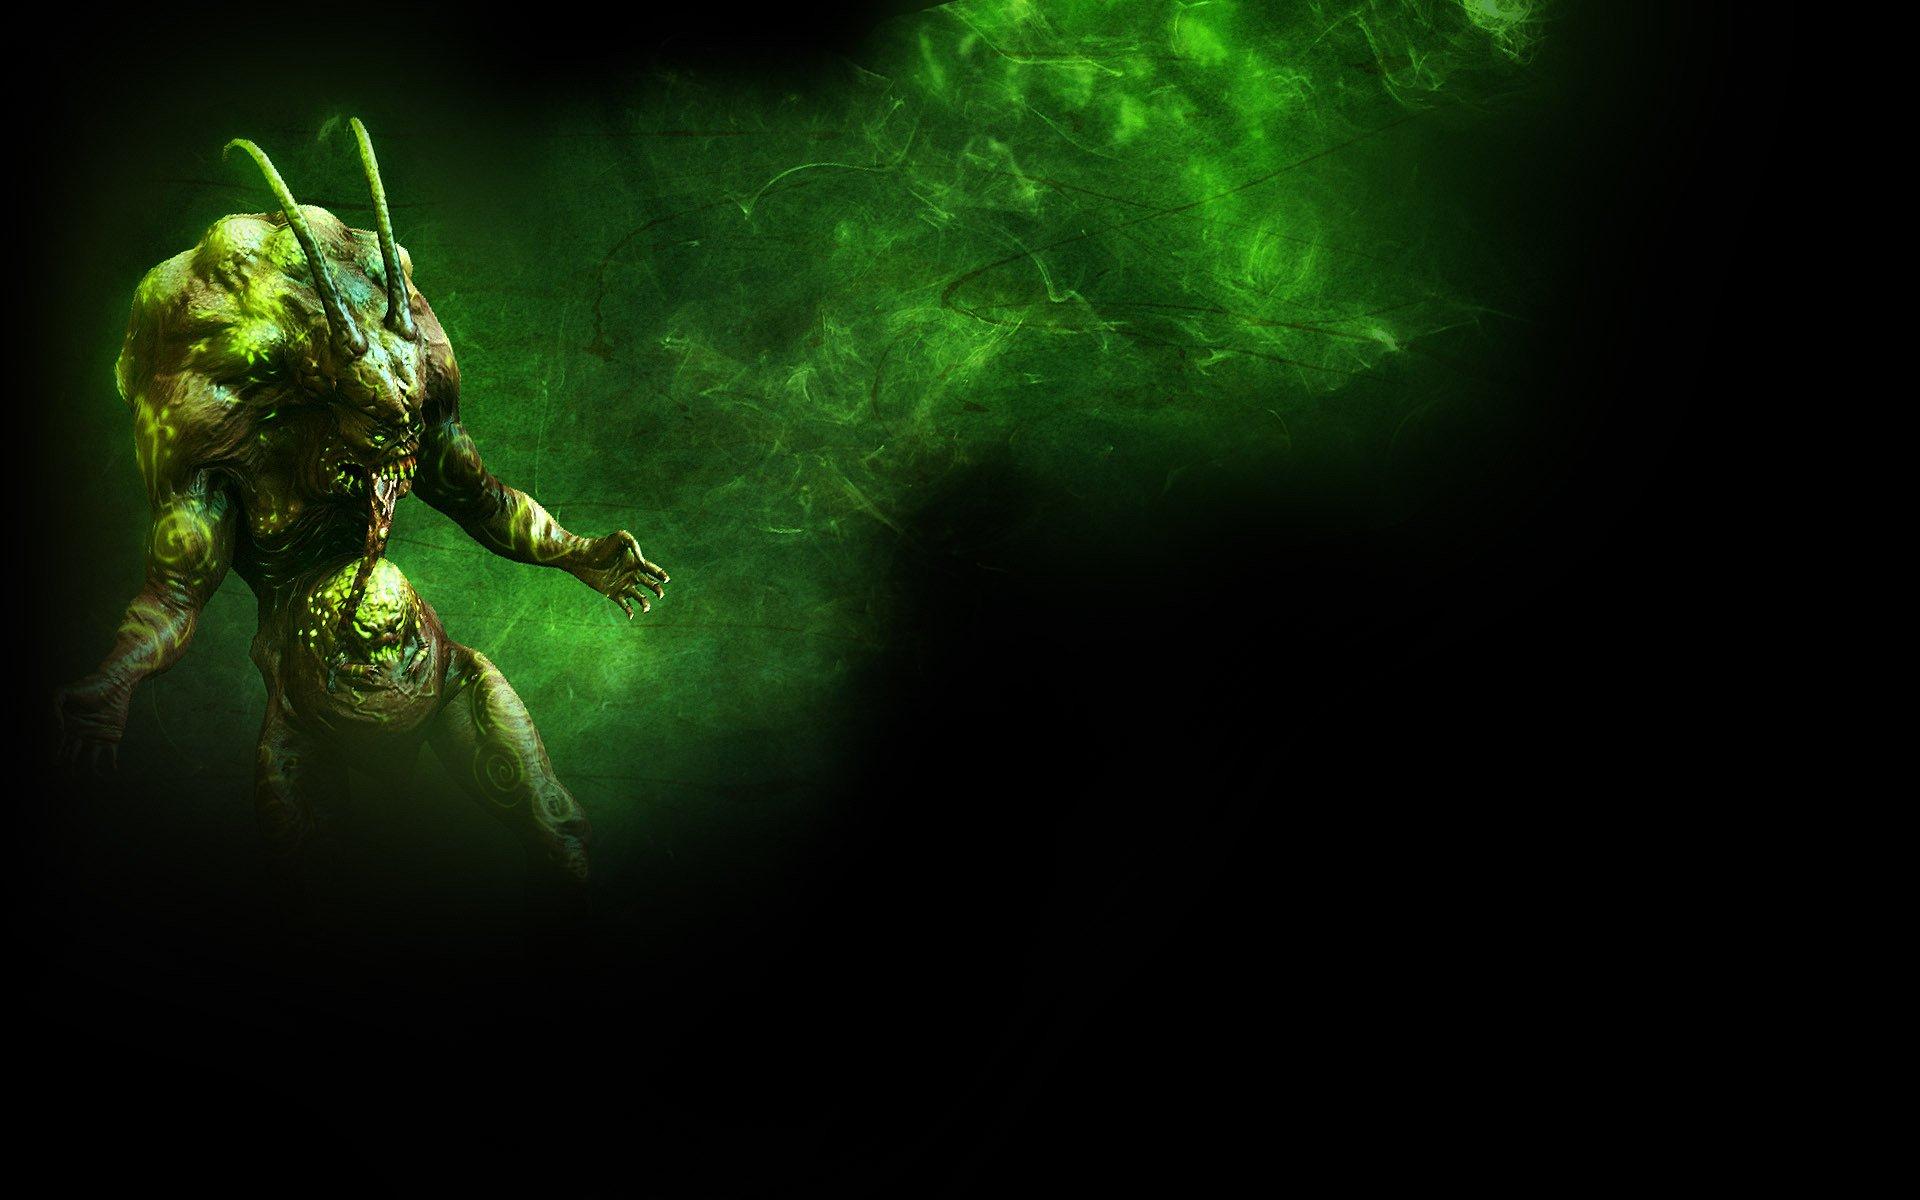 Shadow Warrior HD Wallpaper